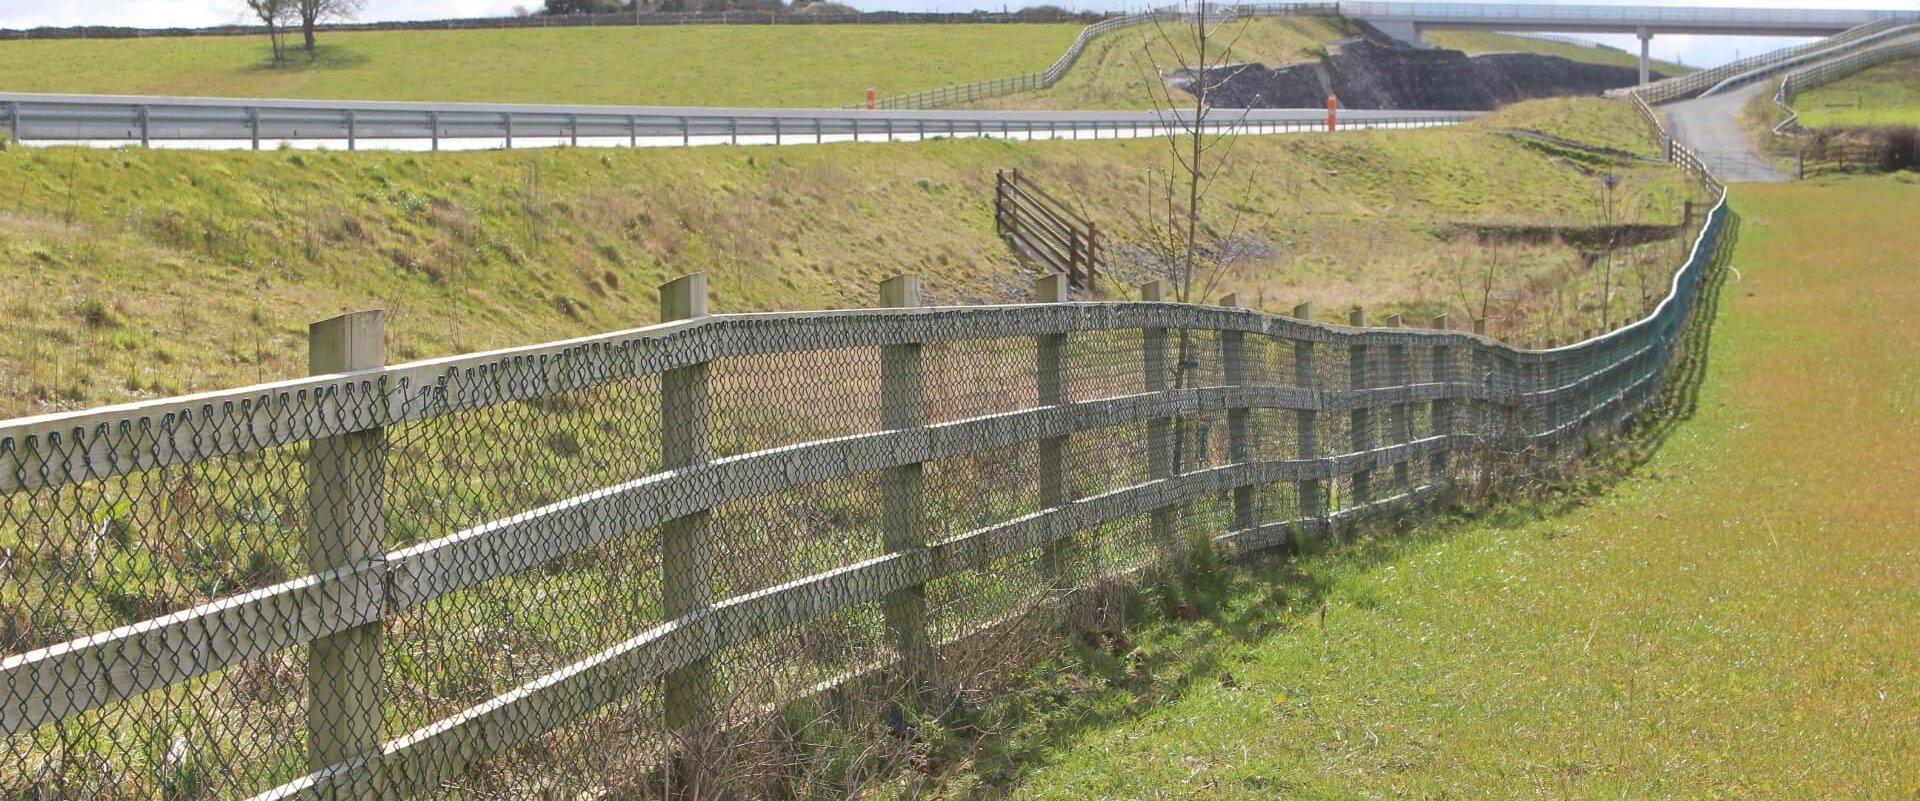 M17 M18 Fence